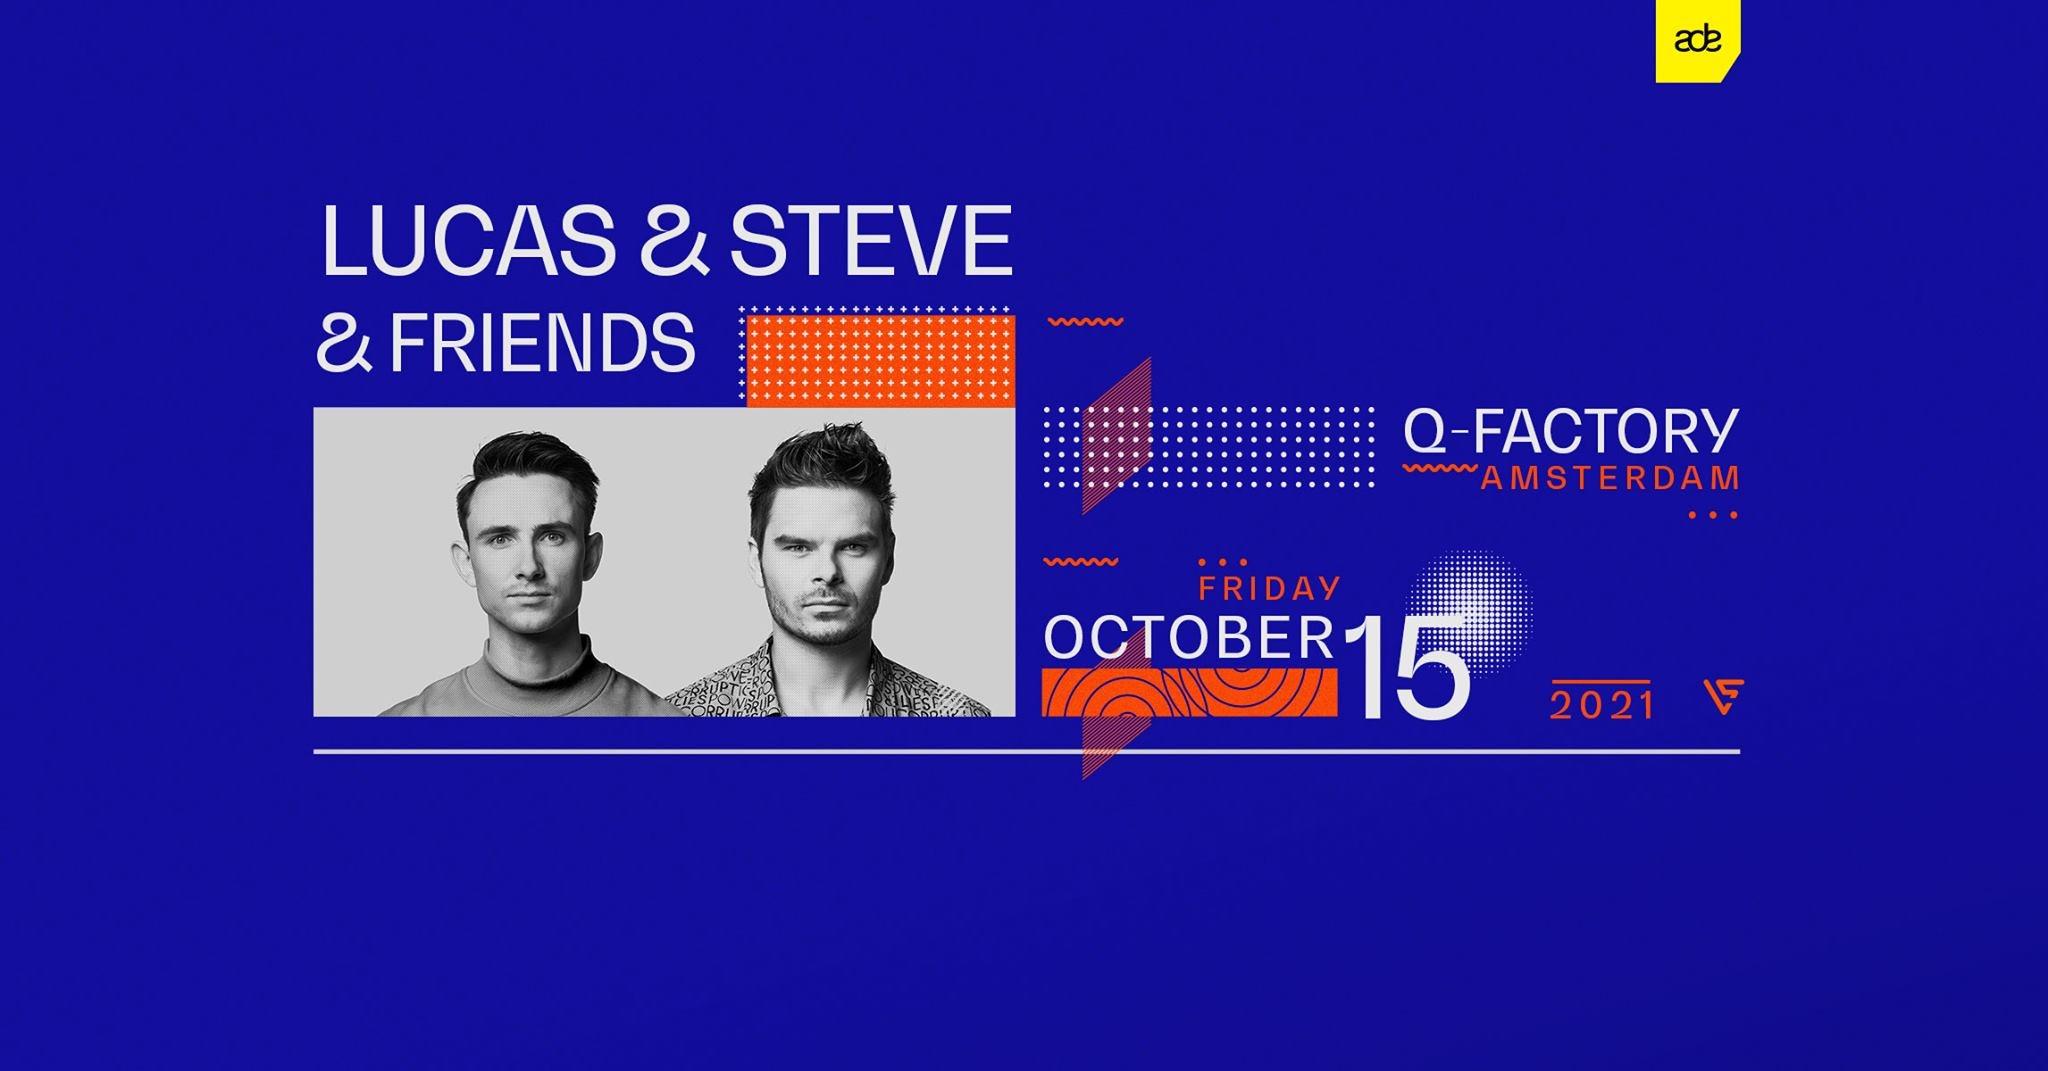 Lucas & Steve & Friends